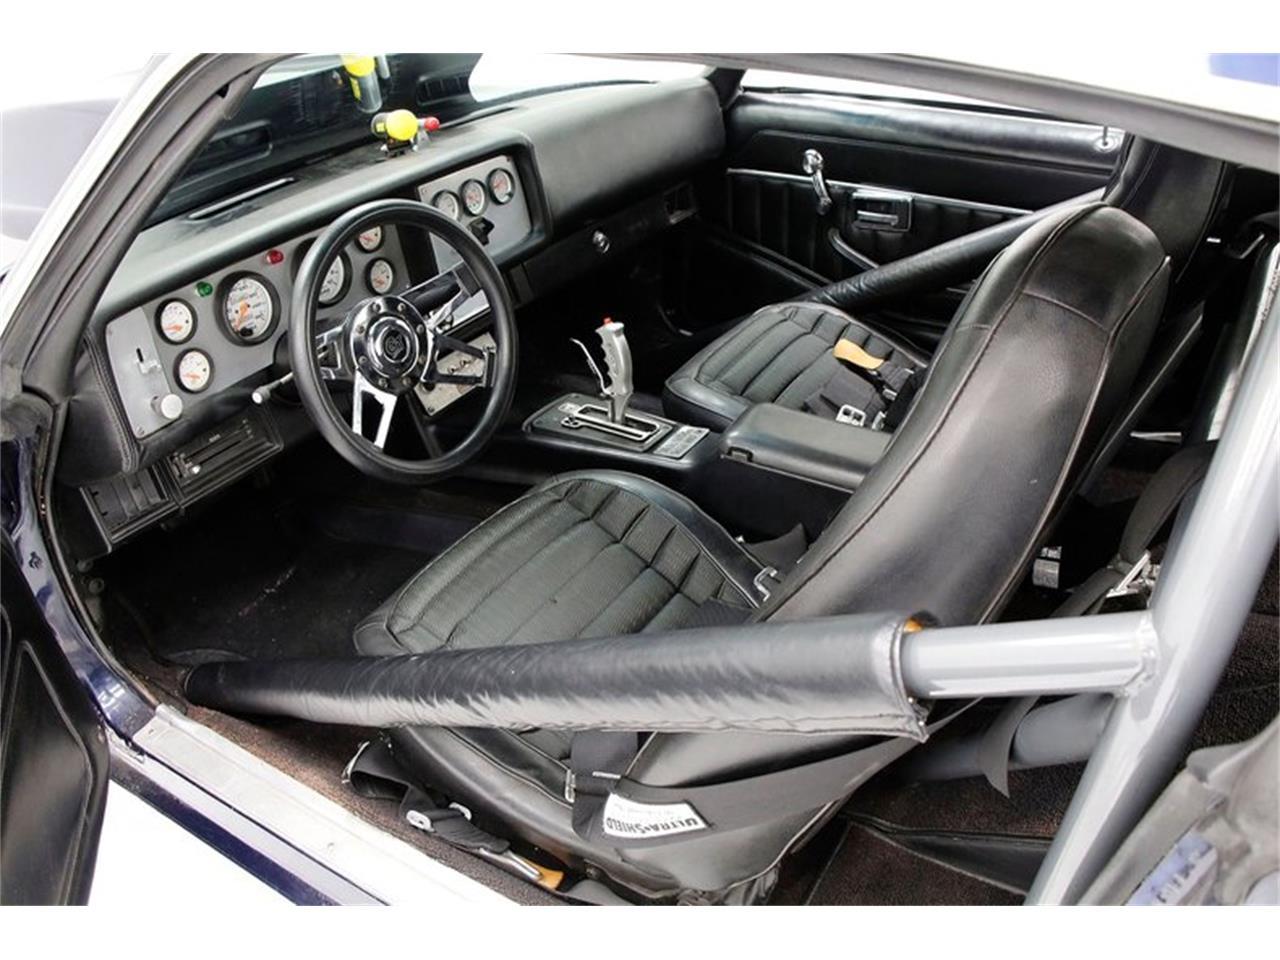 1980 Chevrolet Camaro (CC-1274738) for sale in Morgantown, Pennsylvania